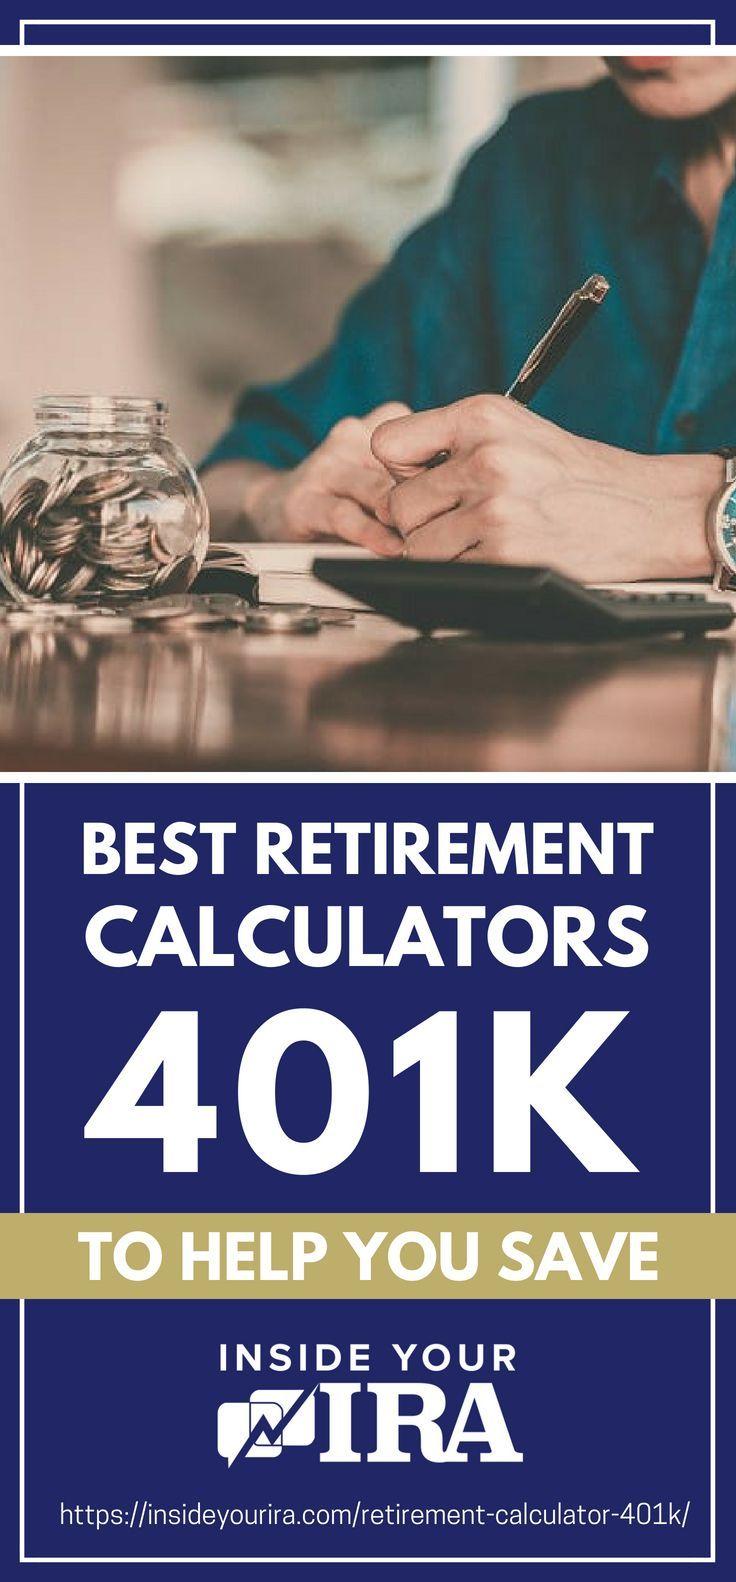 Best Retirement Calculators 401 K To Help You Save Inside Your Ira Retirement Calculator 401k Retirement Calculator Investing For Retirement